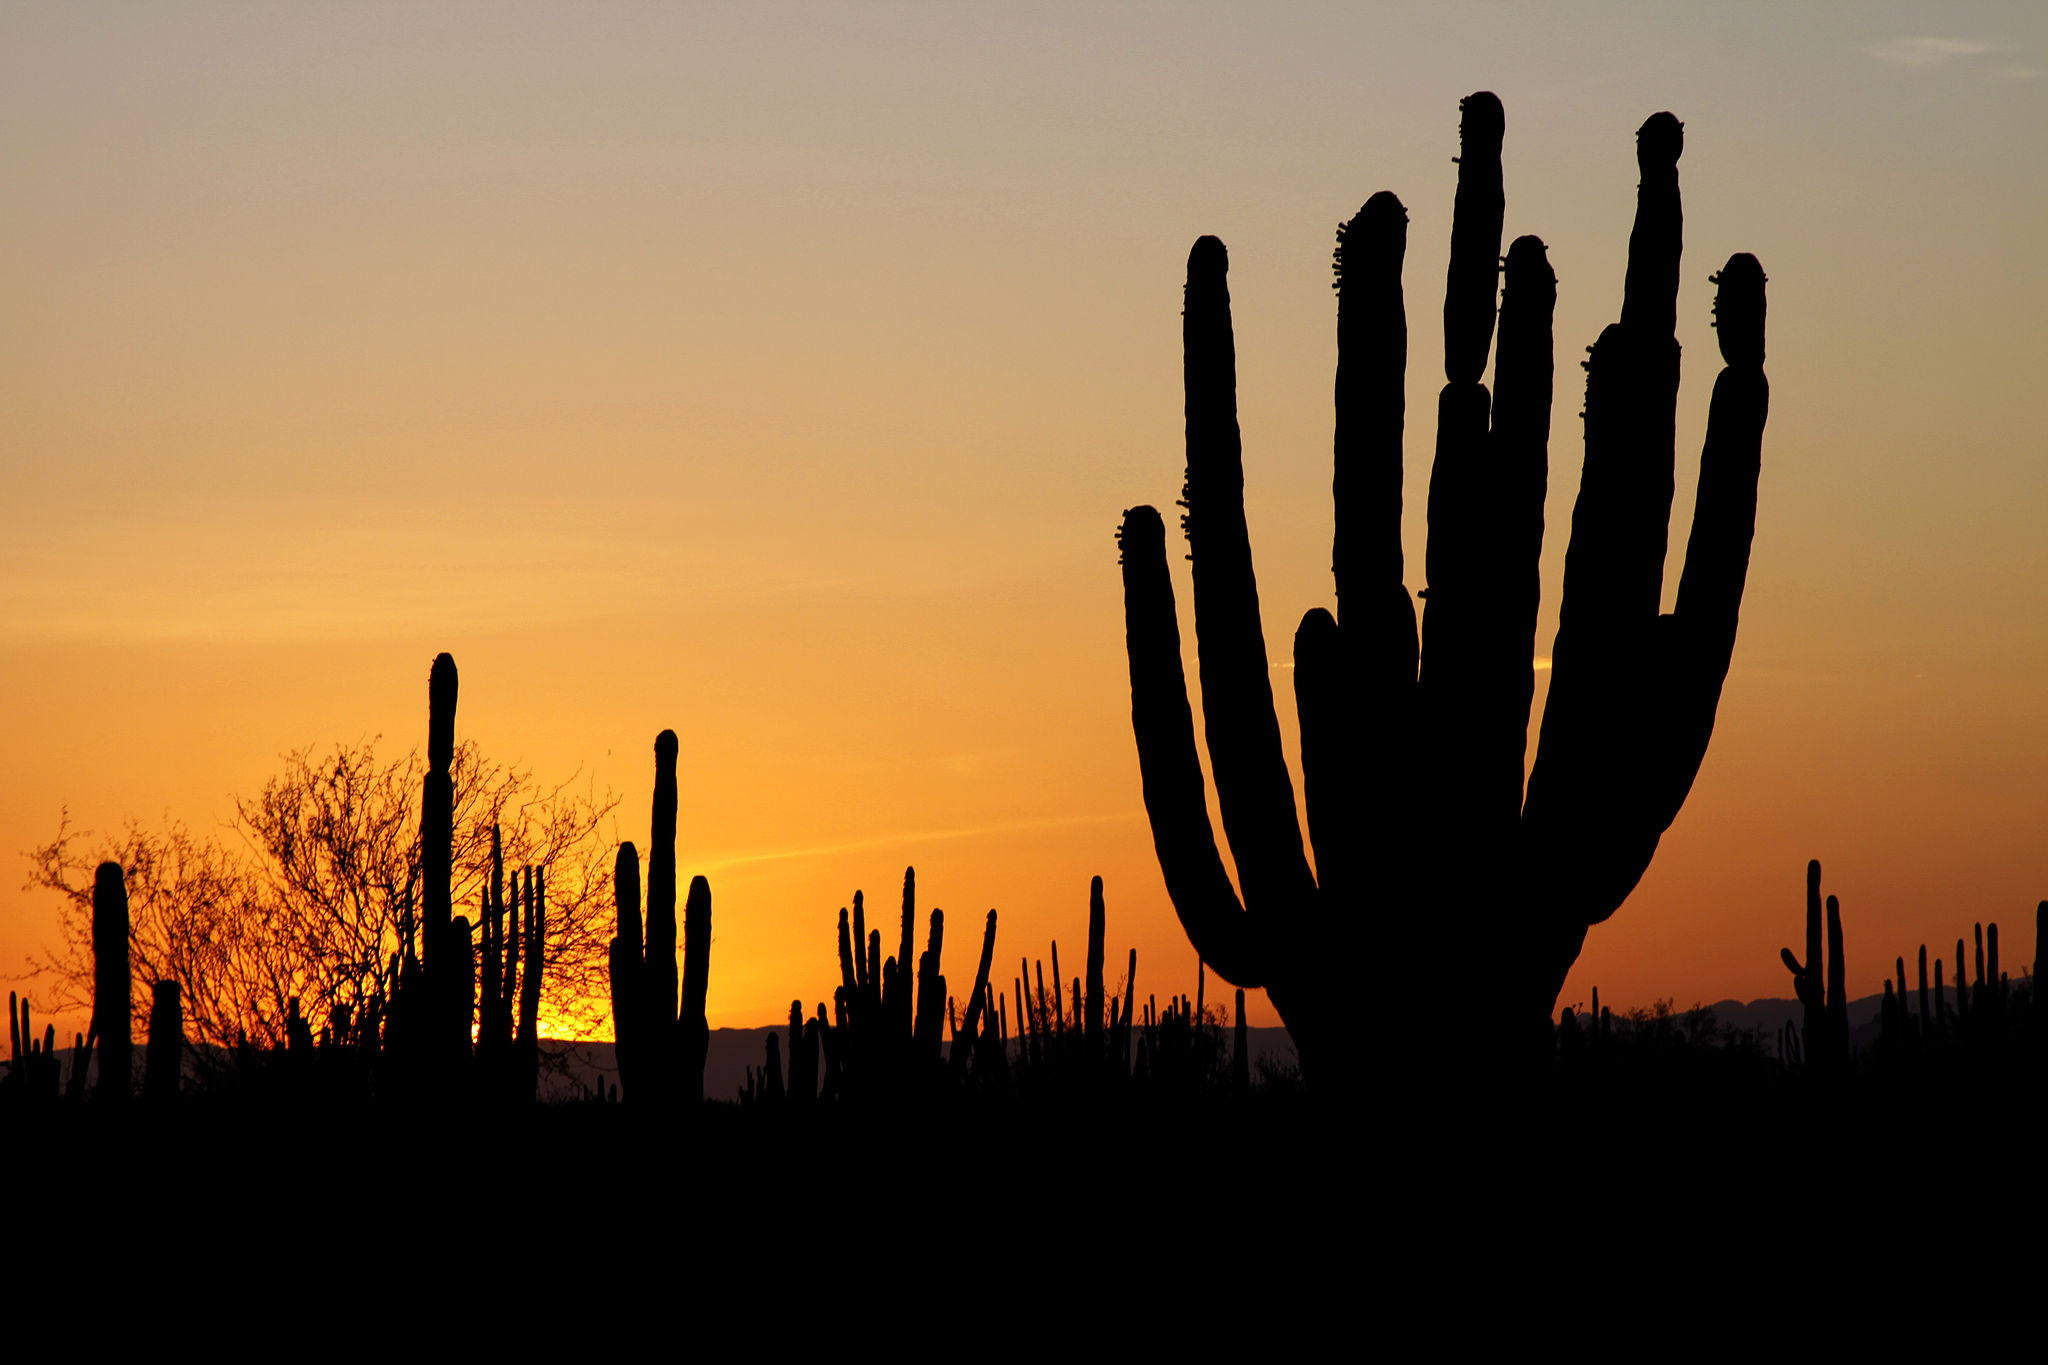 Sonoran desert | © Tomas Castelazo/WikiCommons